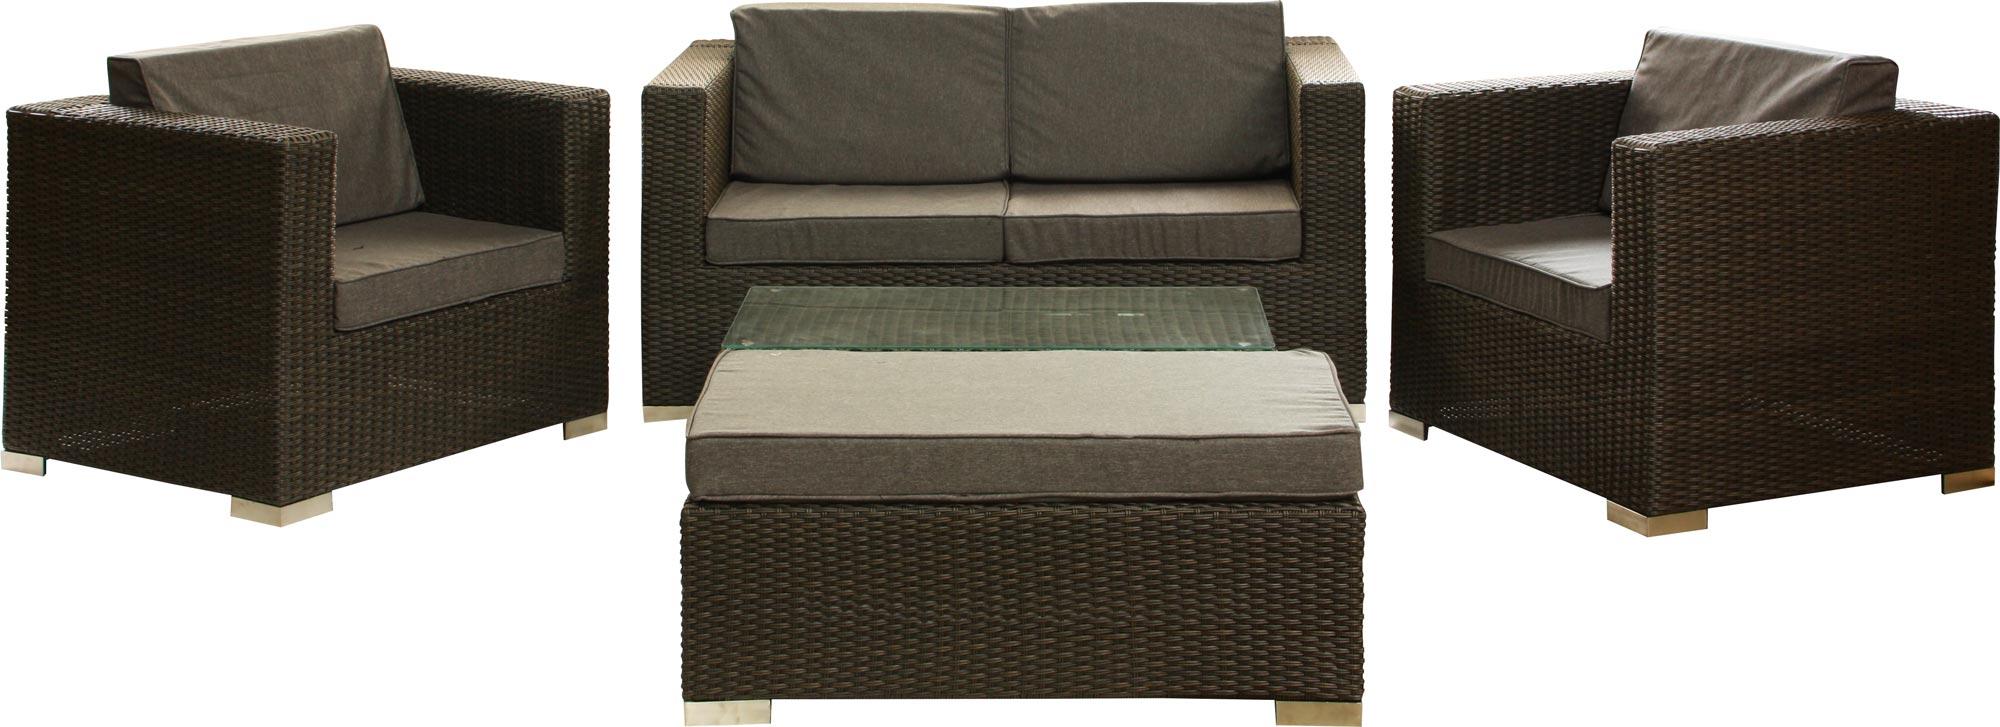 ssv luxus lounge garnitur exquise 16 tlg gartenm bel rattan sitzgruppe uvp 1299 ebay. Black Bedroom Furniture Sets. Home Design Ideas